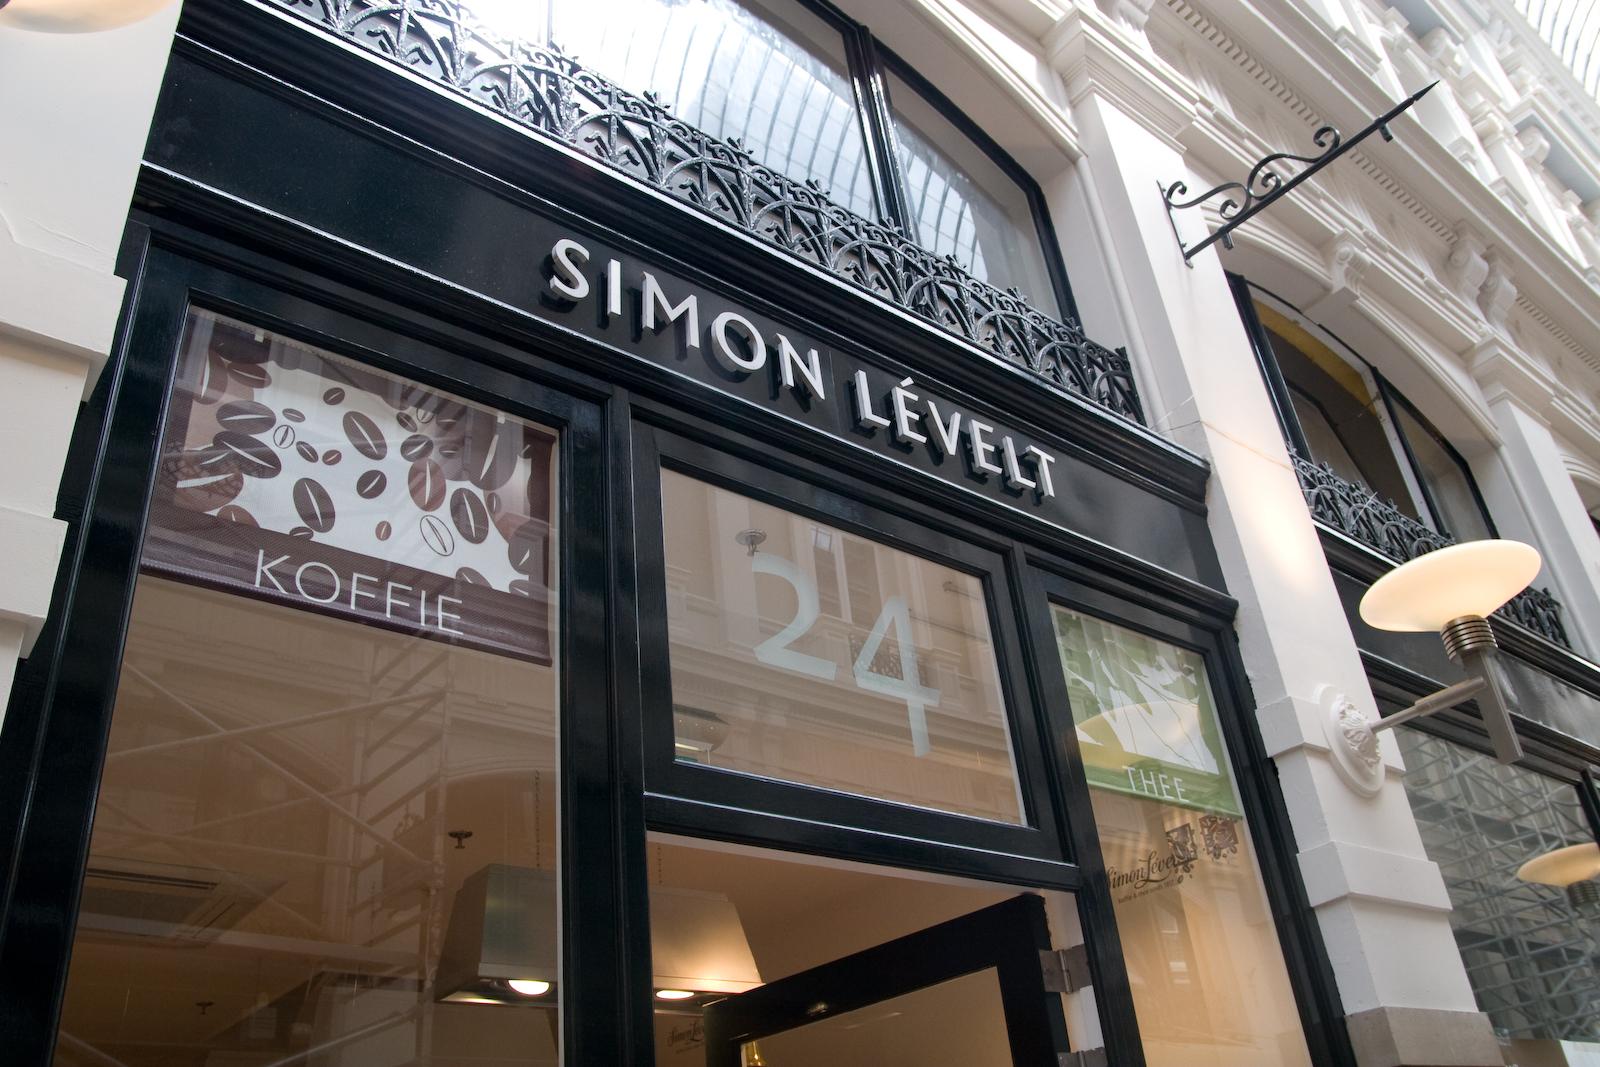 Crisis in retailland? Simon Lévelt groeit in Nederland naar 42 winkels! Bron: FranchiseFormules.NL